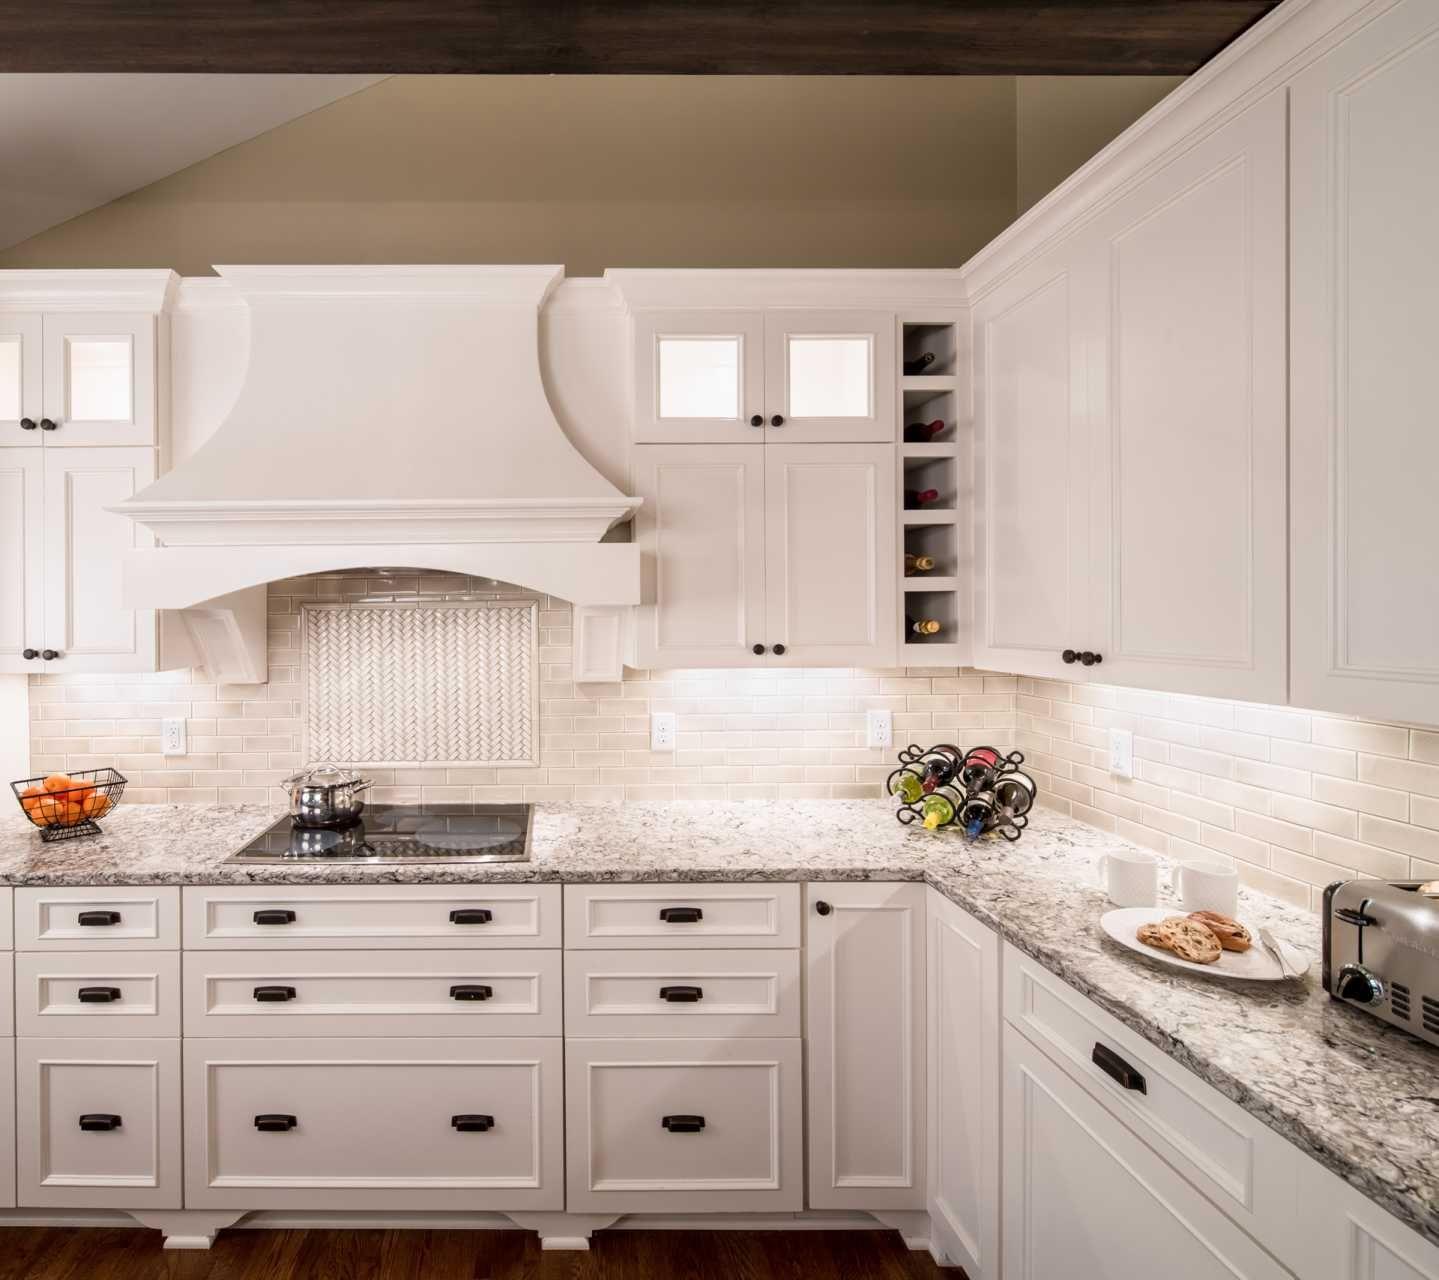 Cambria Bellingham With Dove White Cabinets Travertine Backsplash